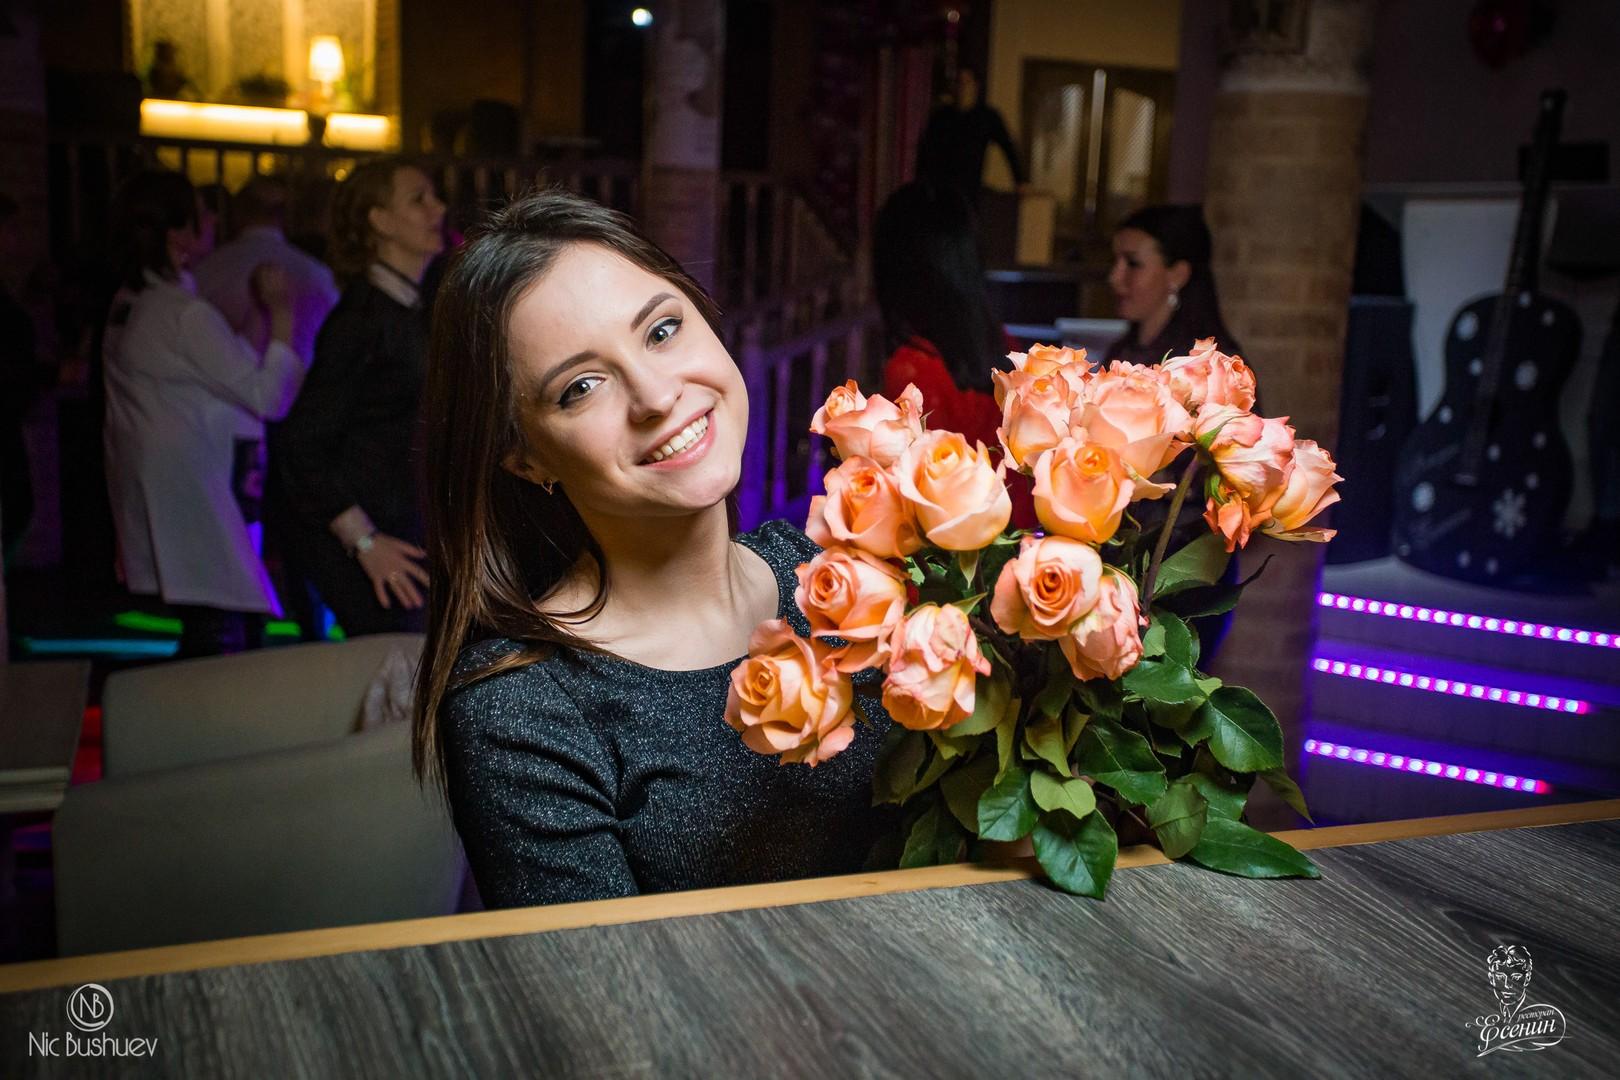 Ресторан Орехово-Зуево Есенин 07_03_2020 (87)